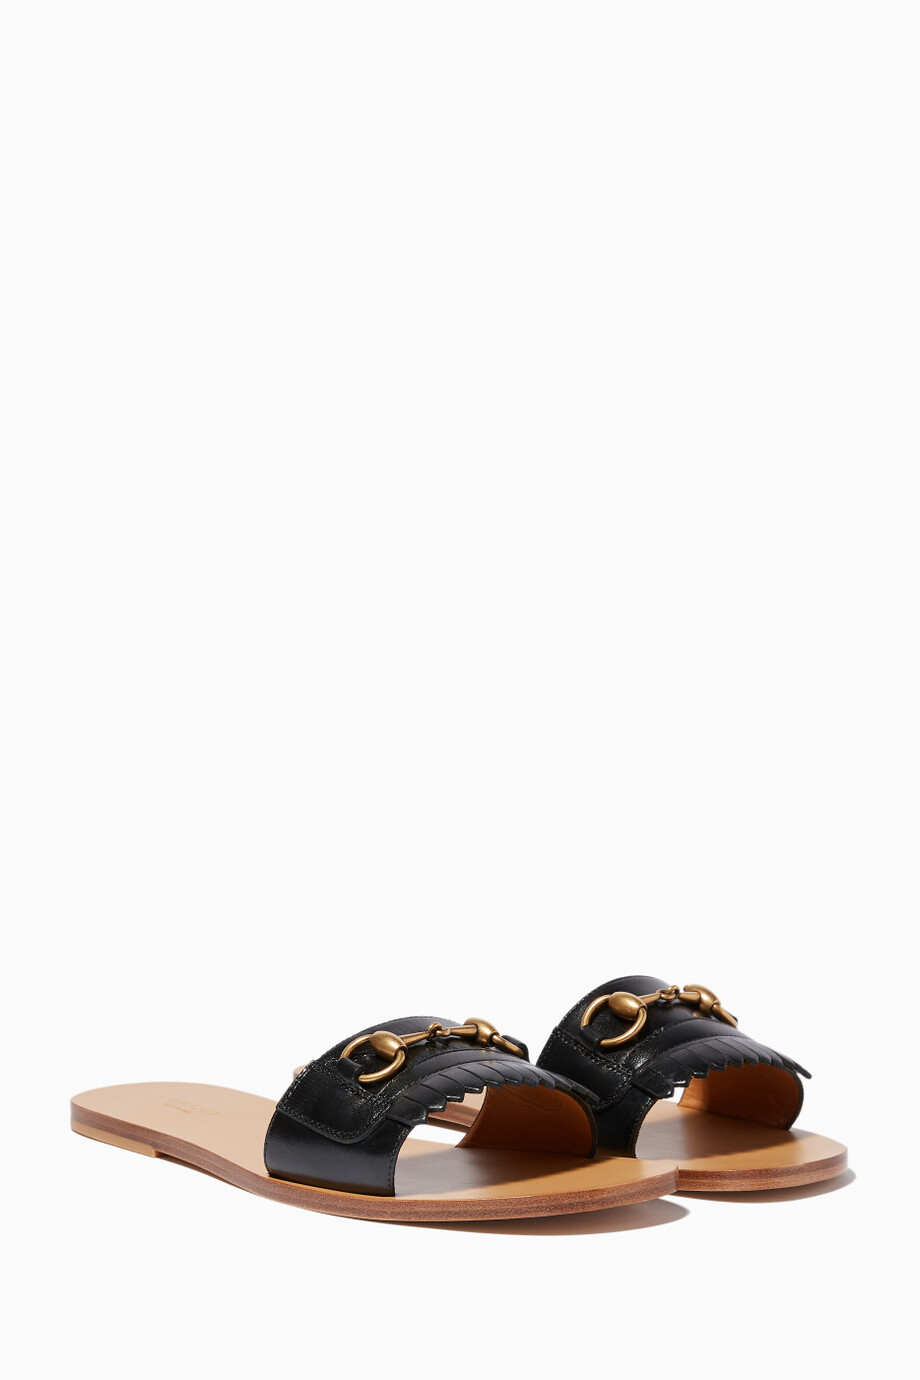 03dea3717e99 Shop Gucci Black Black Fringe Leather Horsebit Slides for Women ...